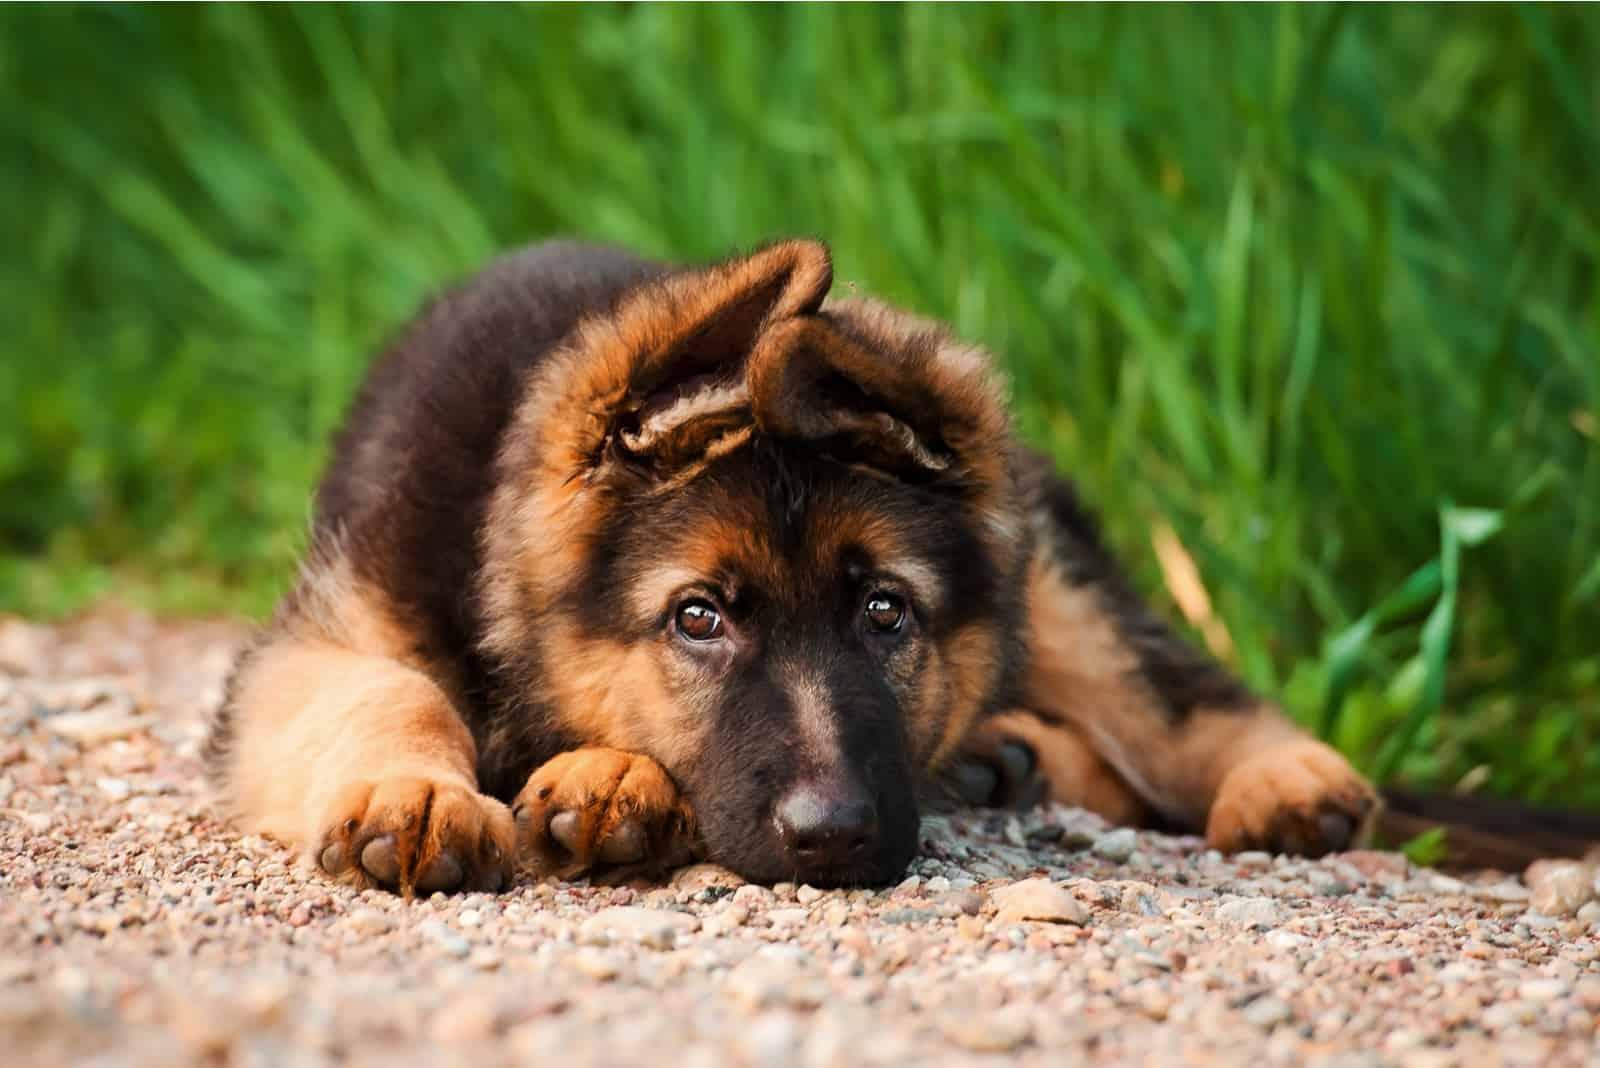 German shepherd puppy lying on the ground